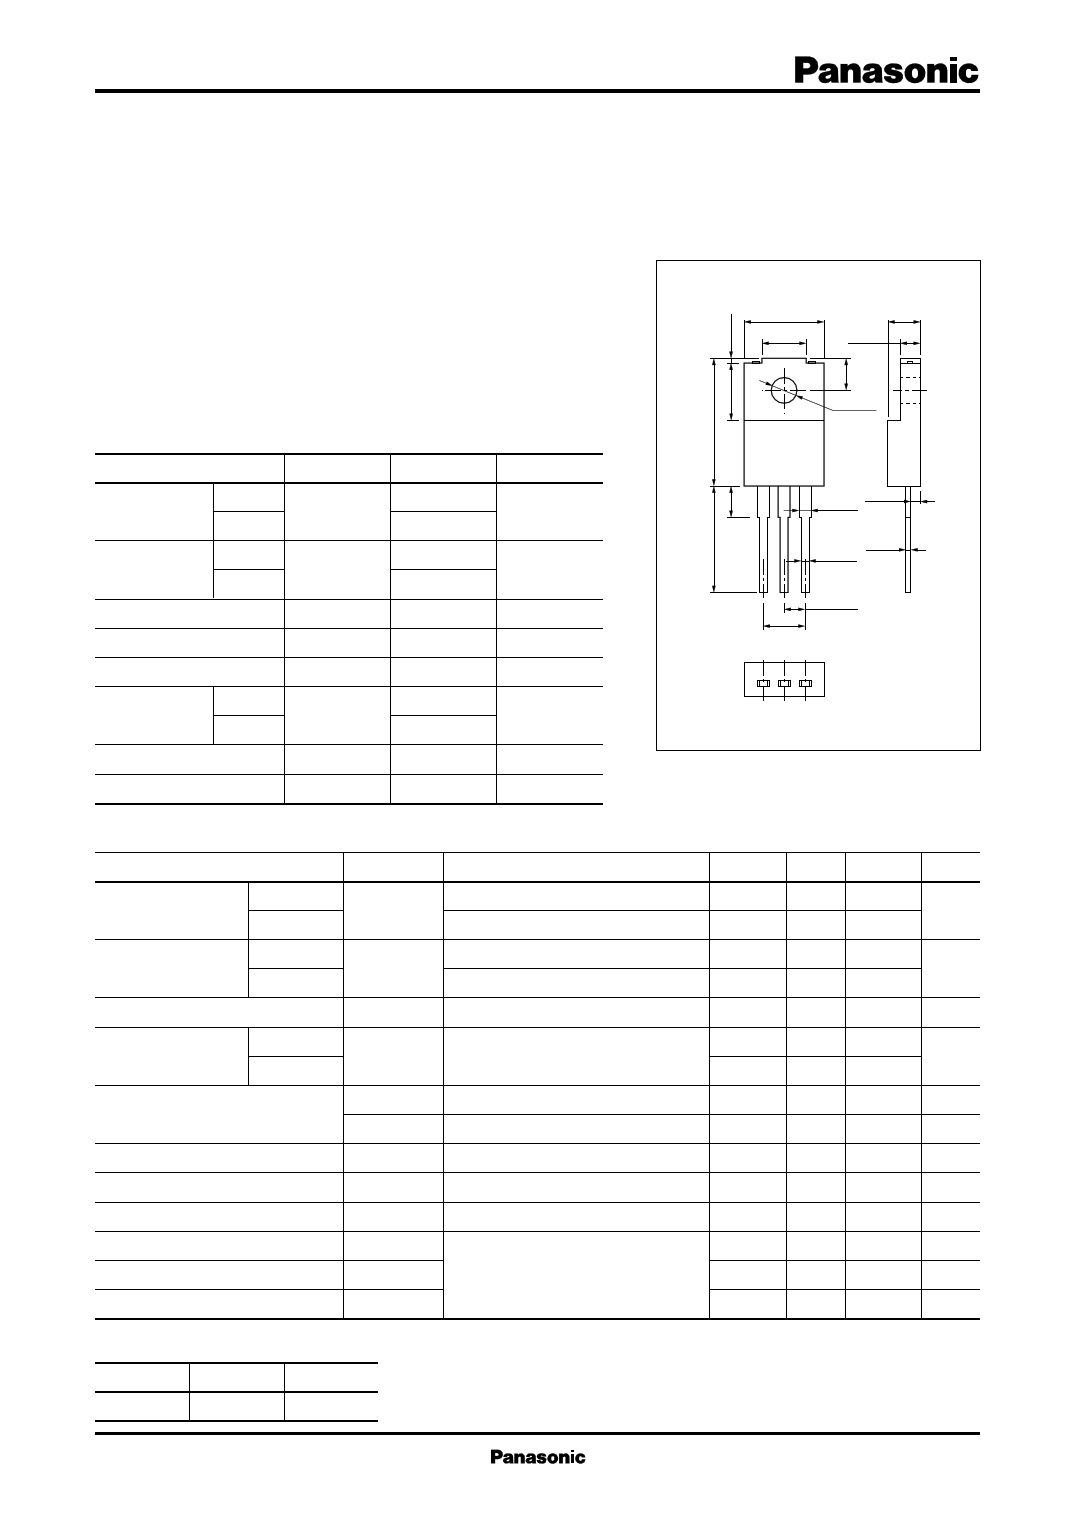 B1393 datasheet